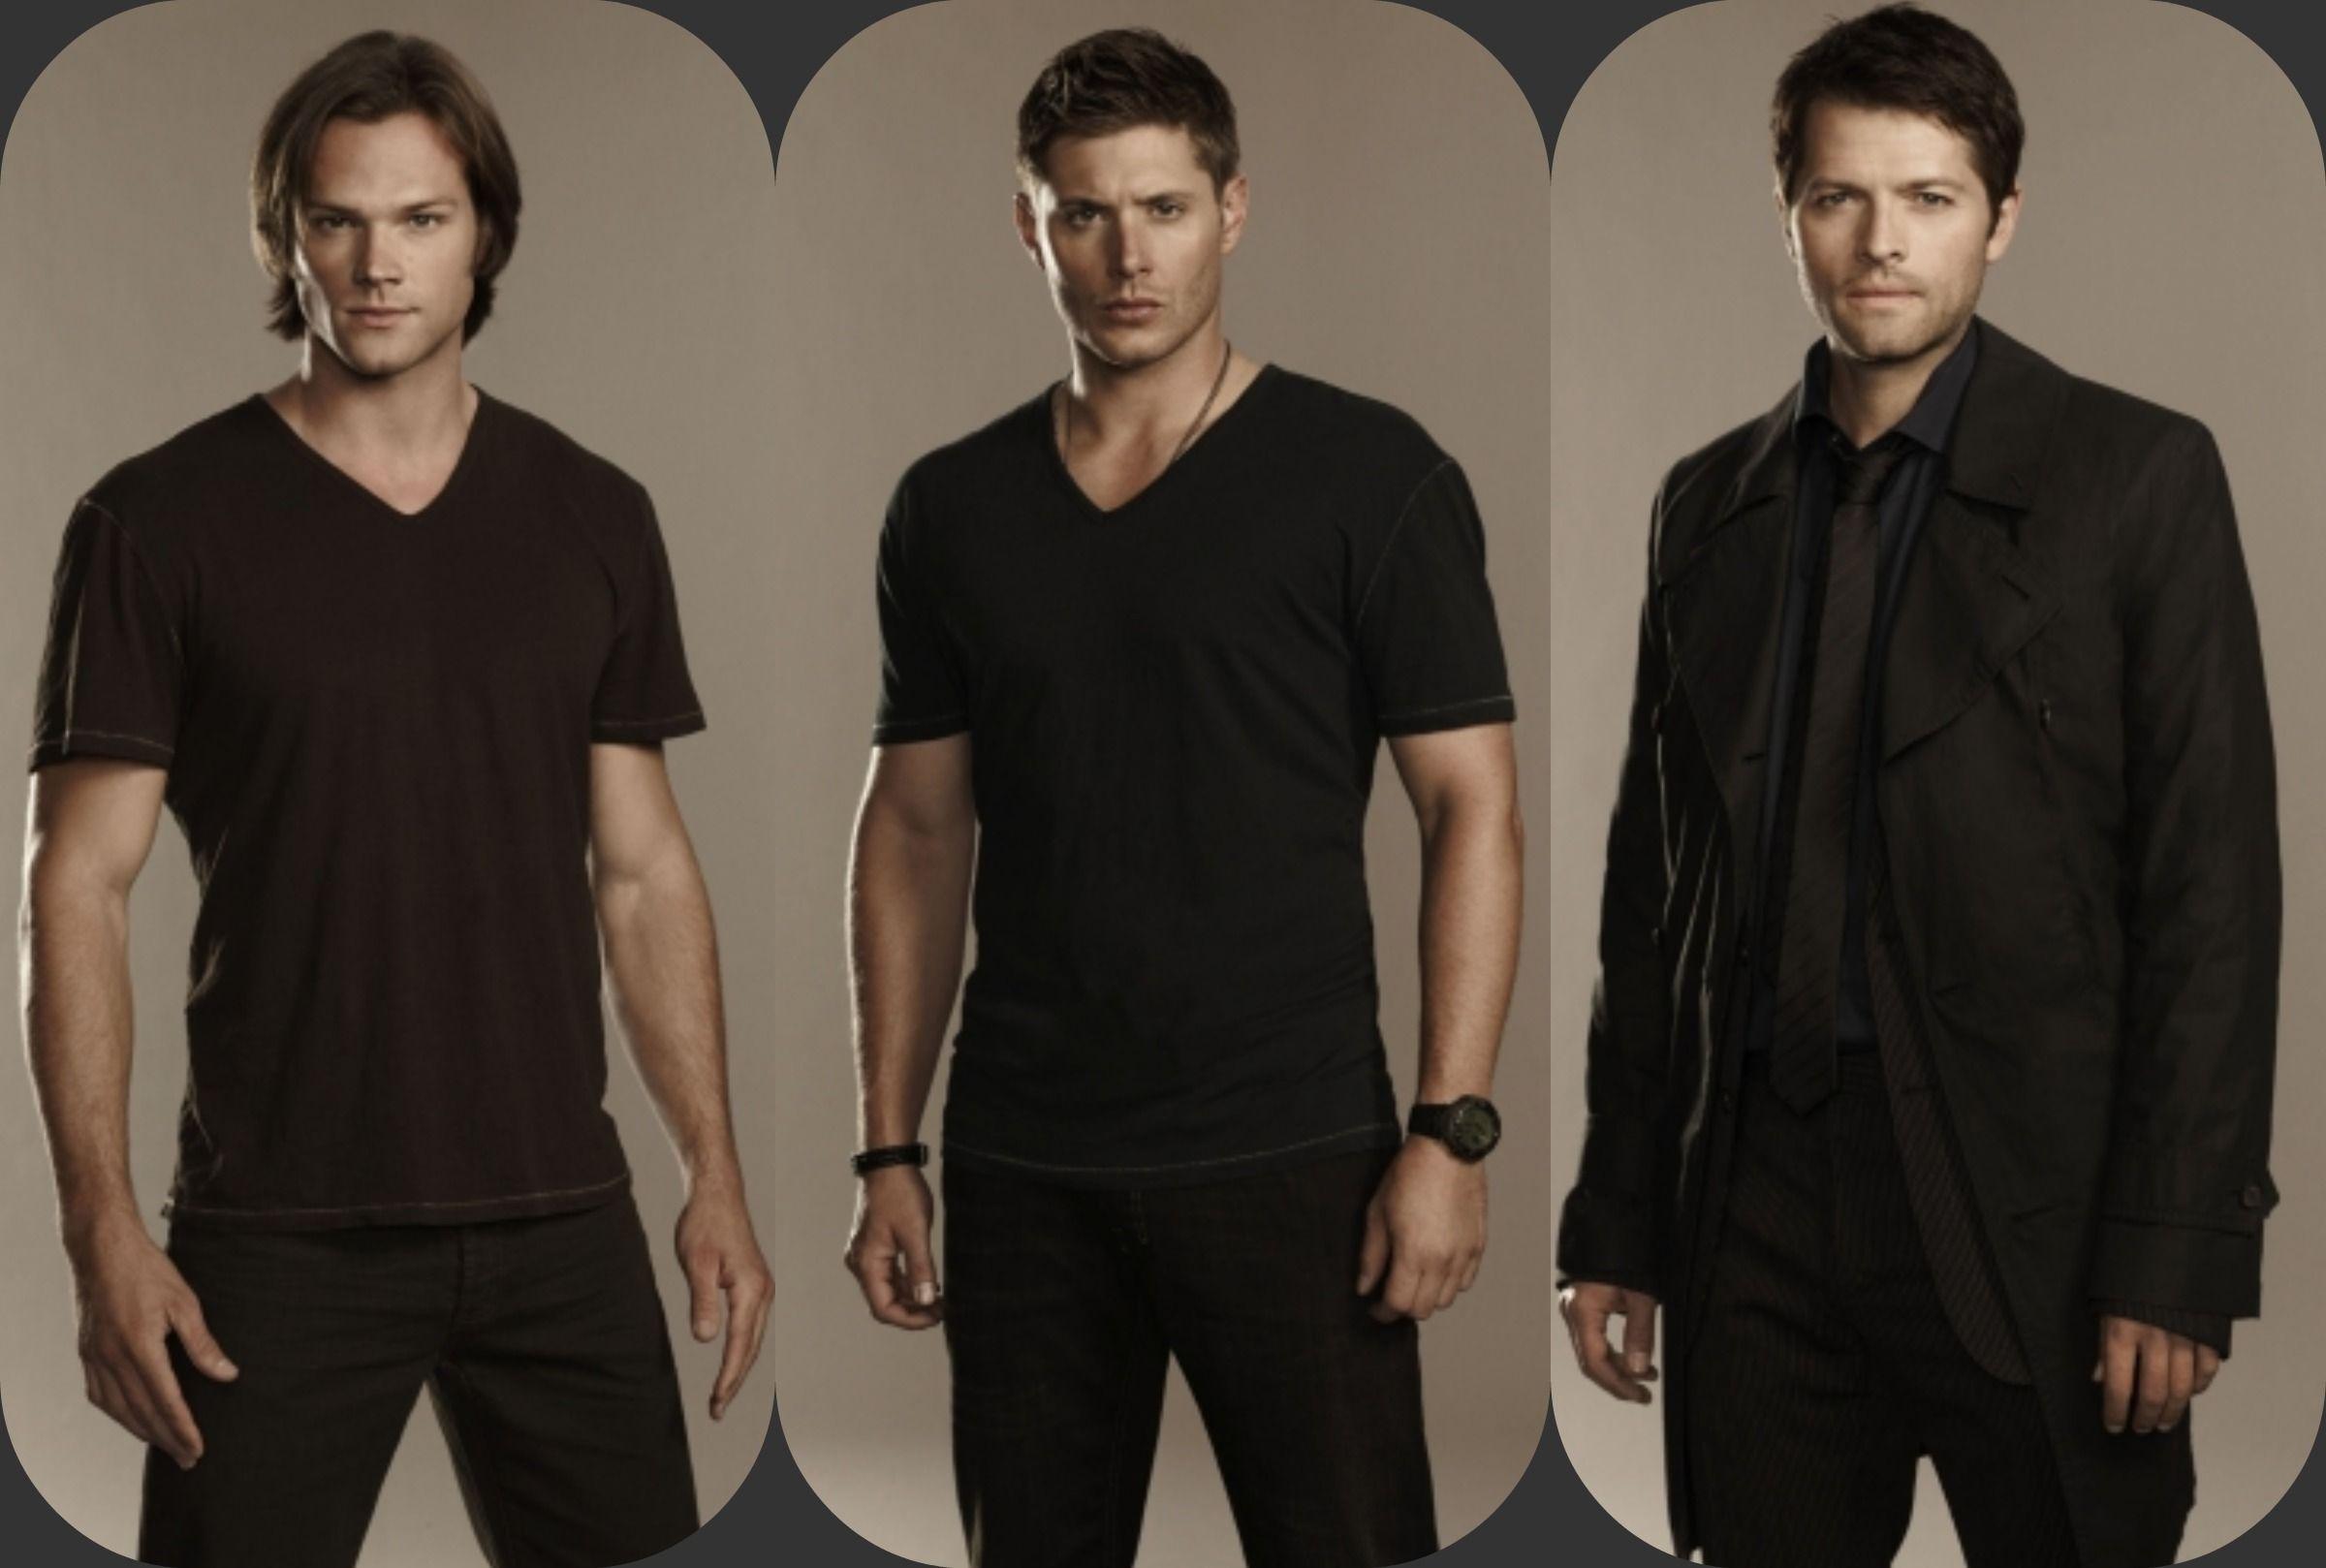 A promo shot of Jared, Jensen & Misha.